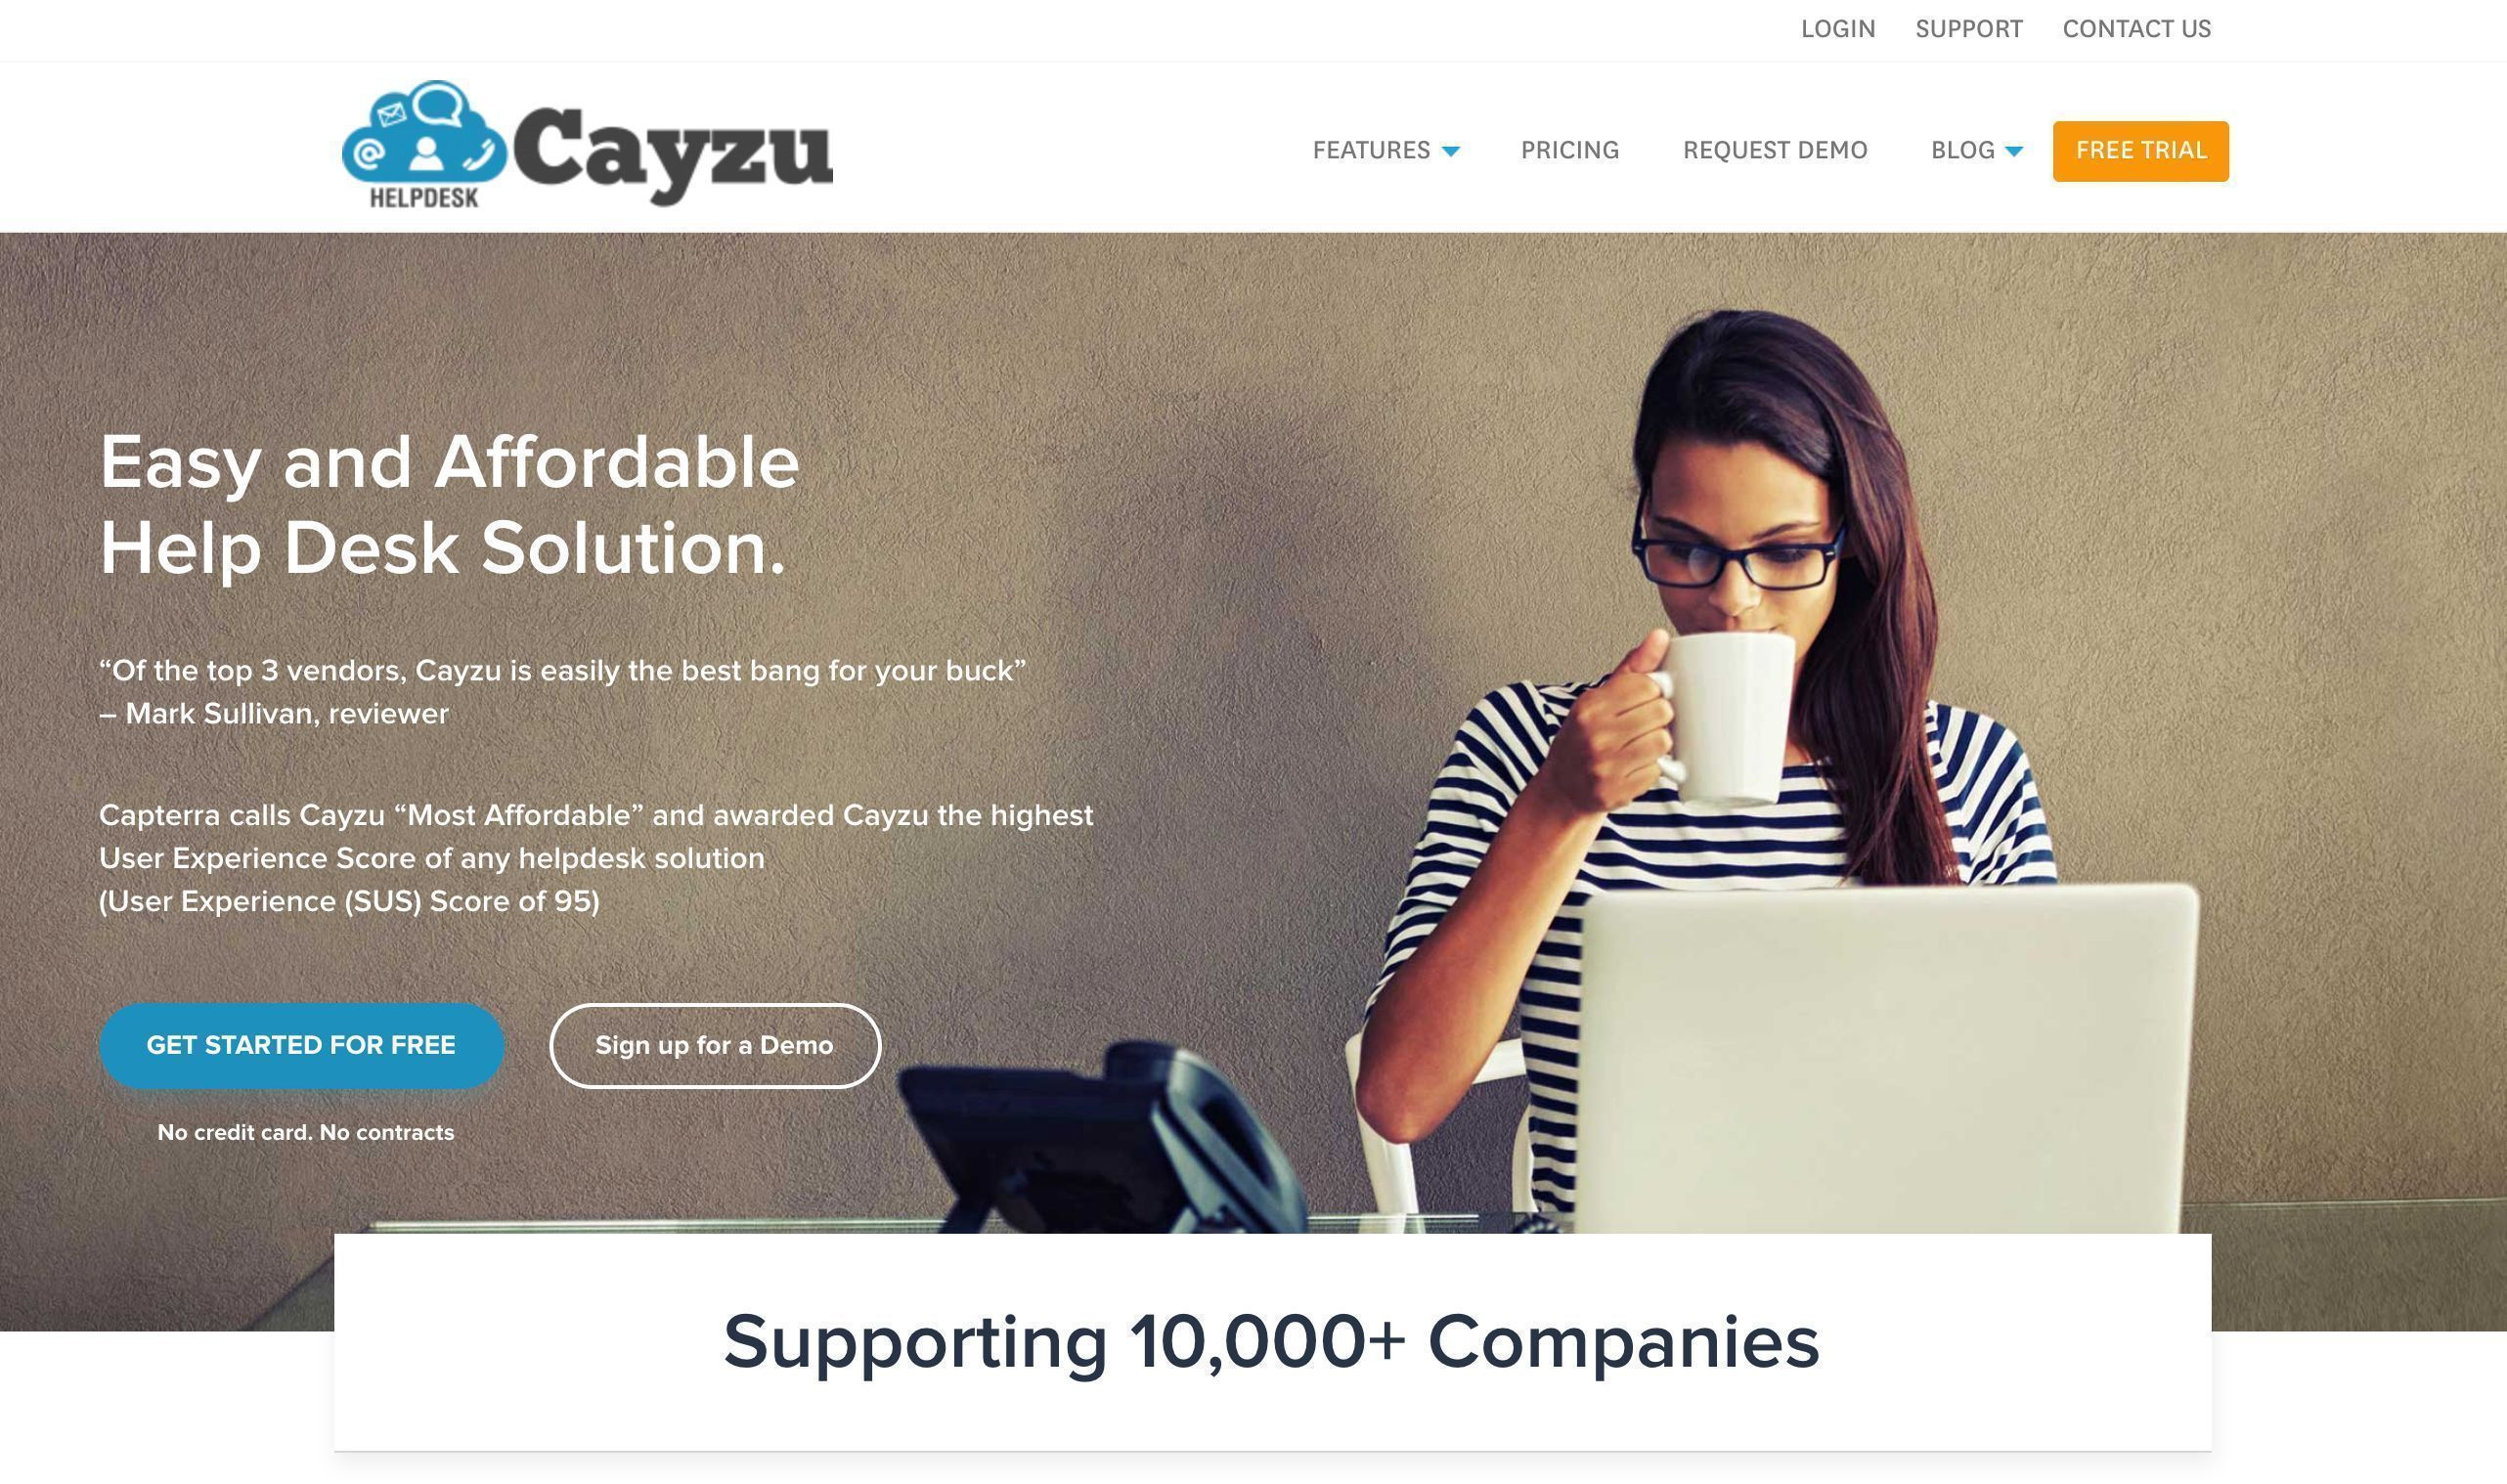 Cayzu home page